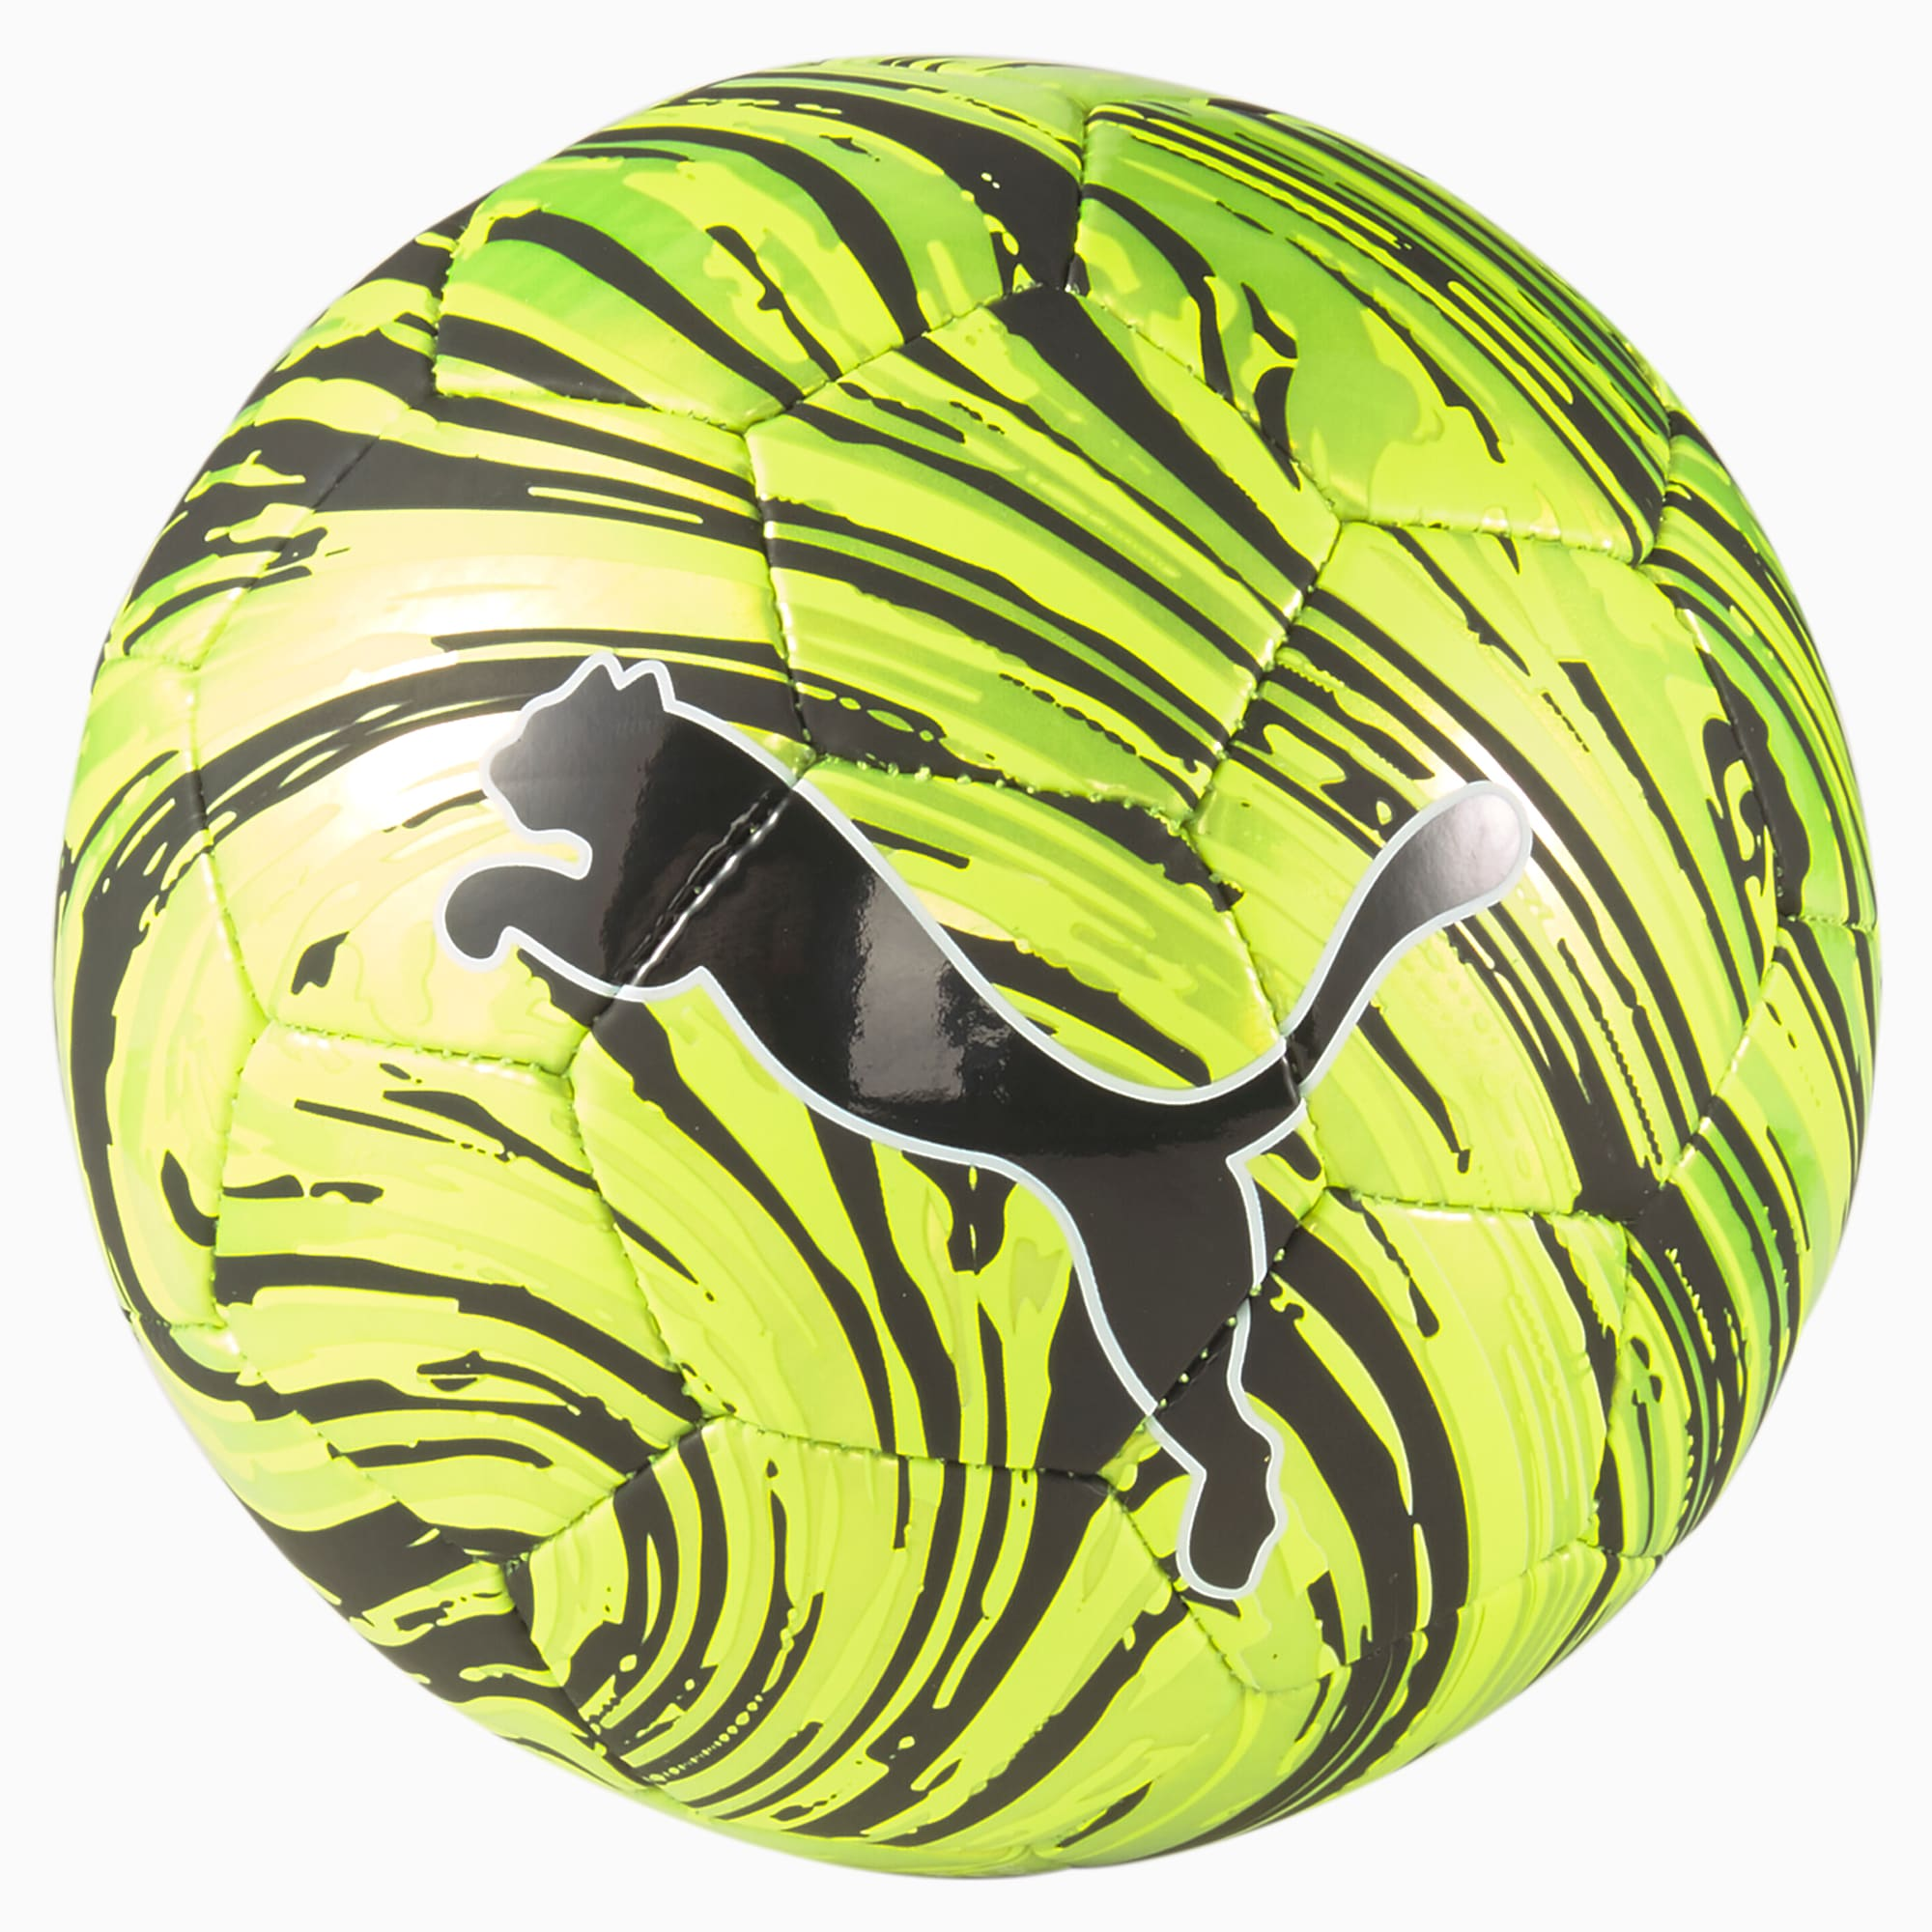 PUMA Shock Mini Ball